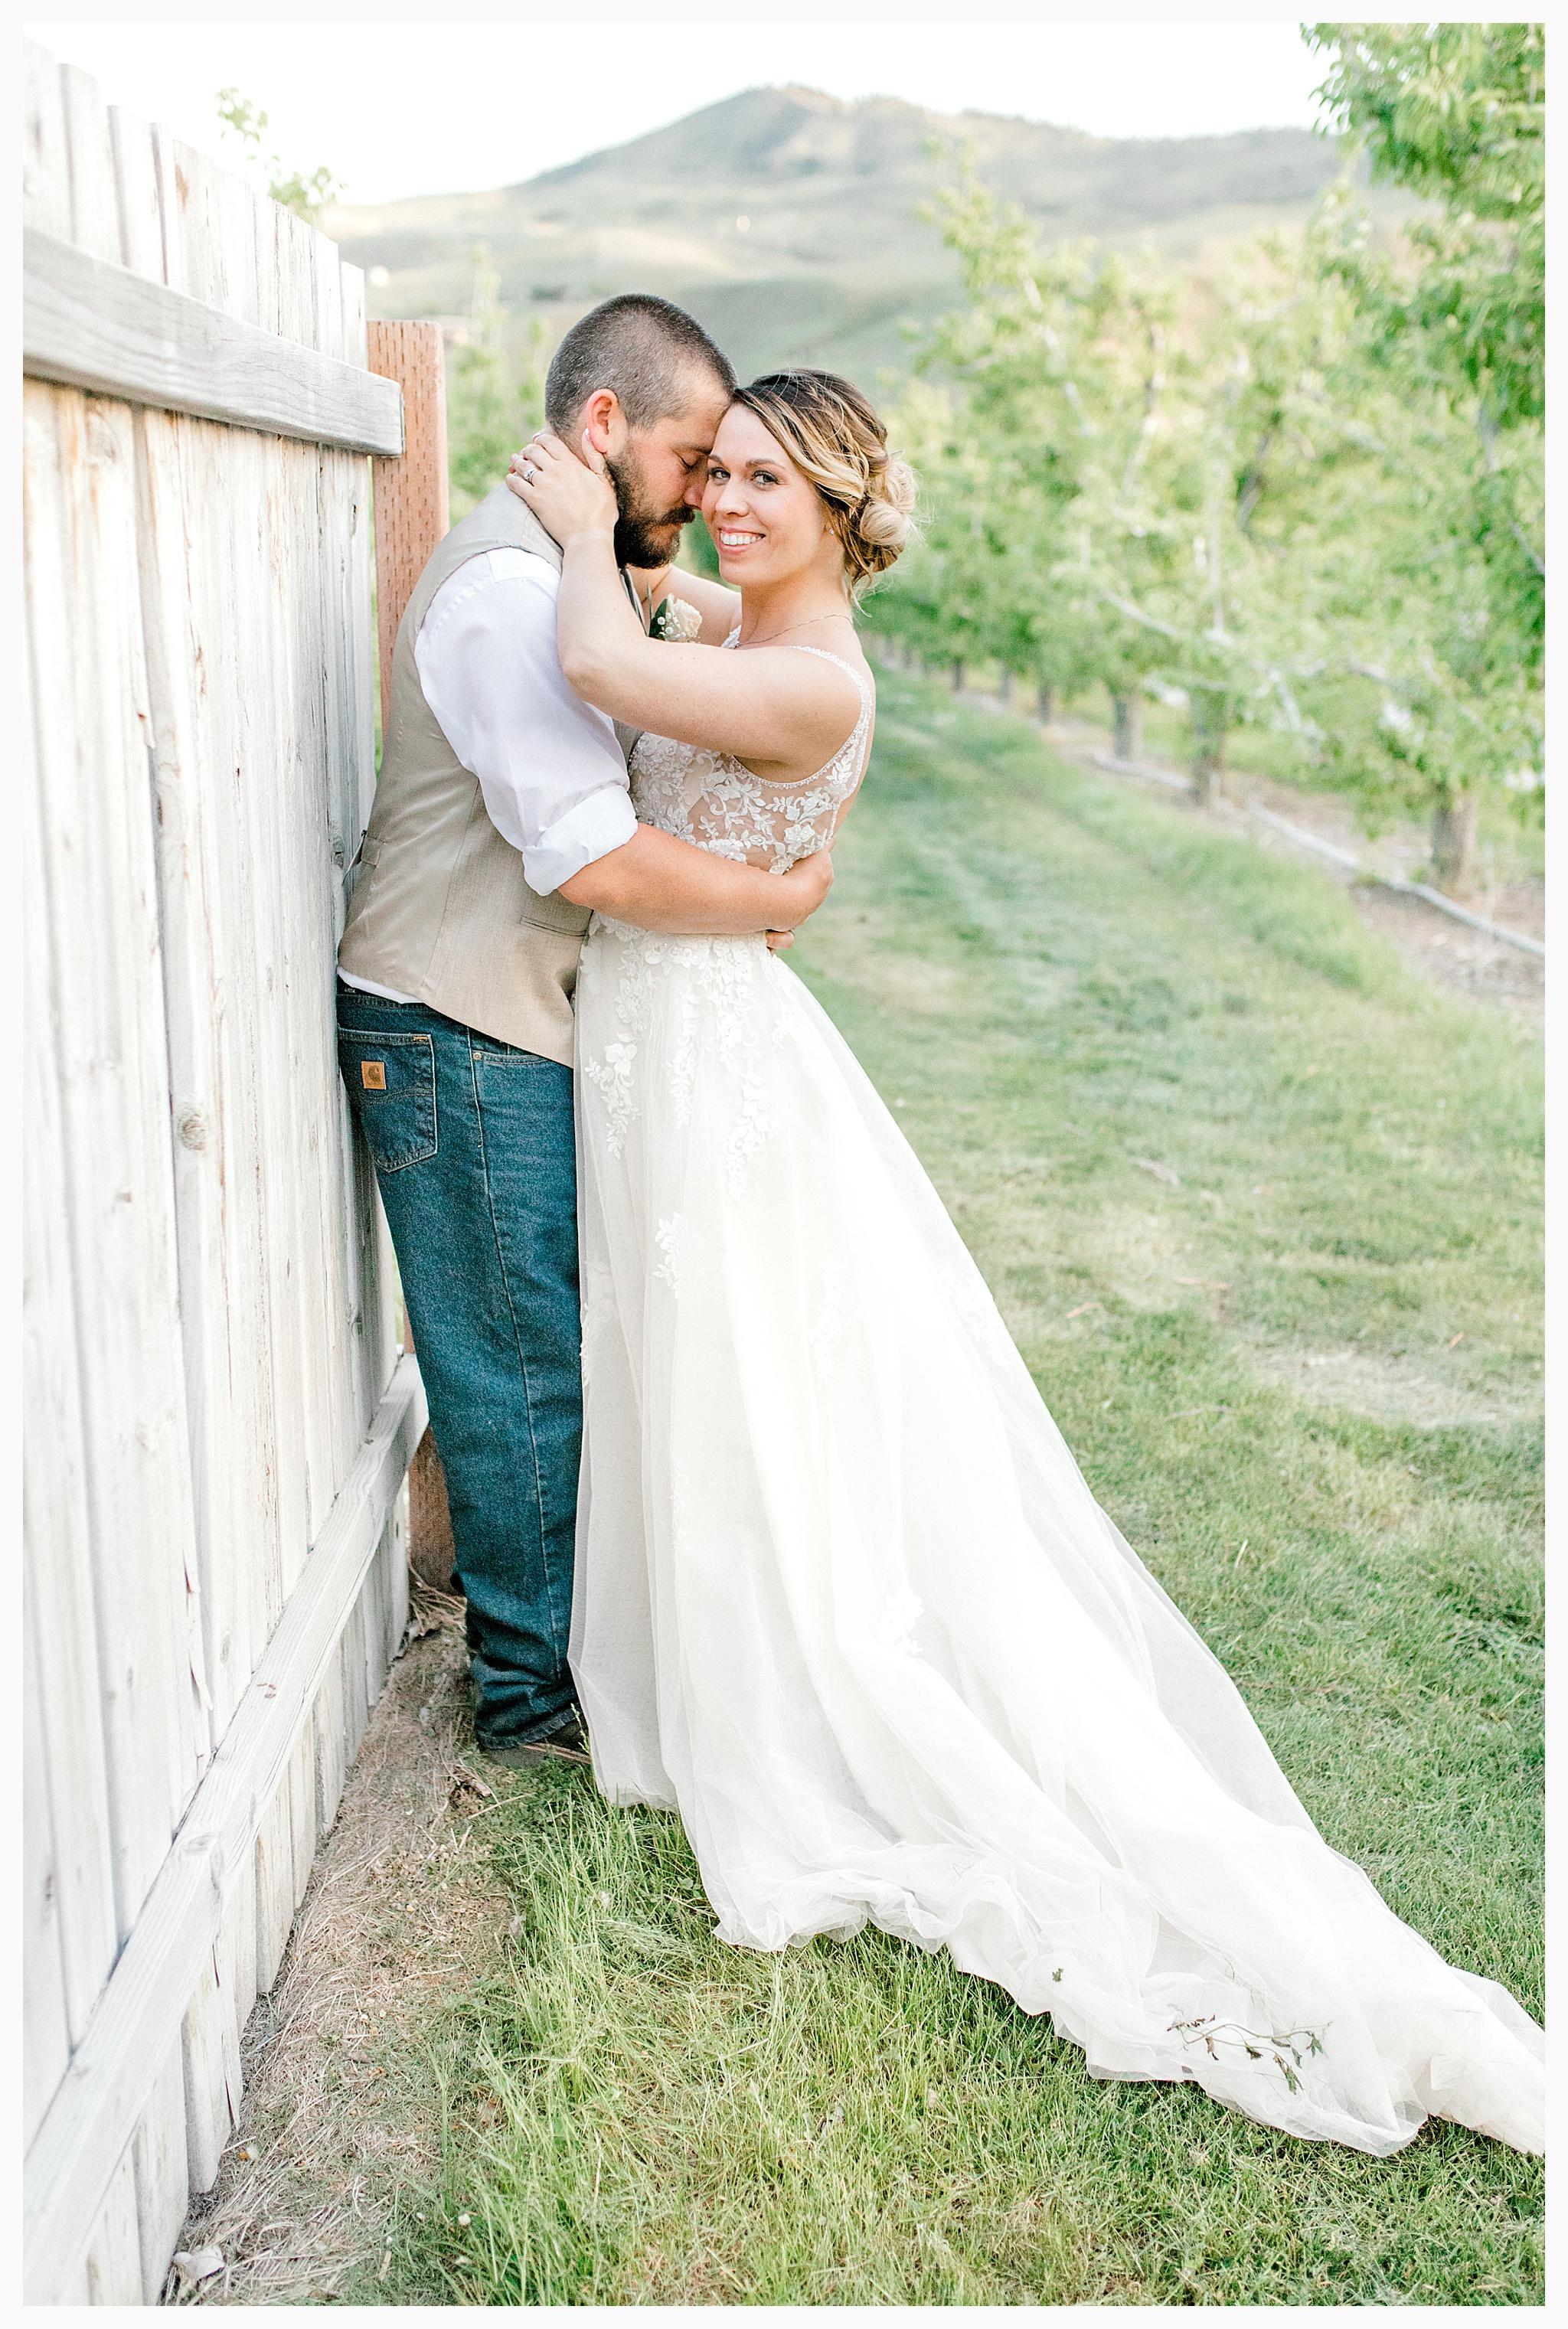 Rustic barn wedding in Wenatchee Washington at Sunshine Ranch on Easy Street, Emma Rose Company Seattle PNW Light and Airy Wedding Photographer_0141.jpg